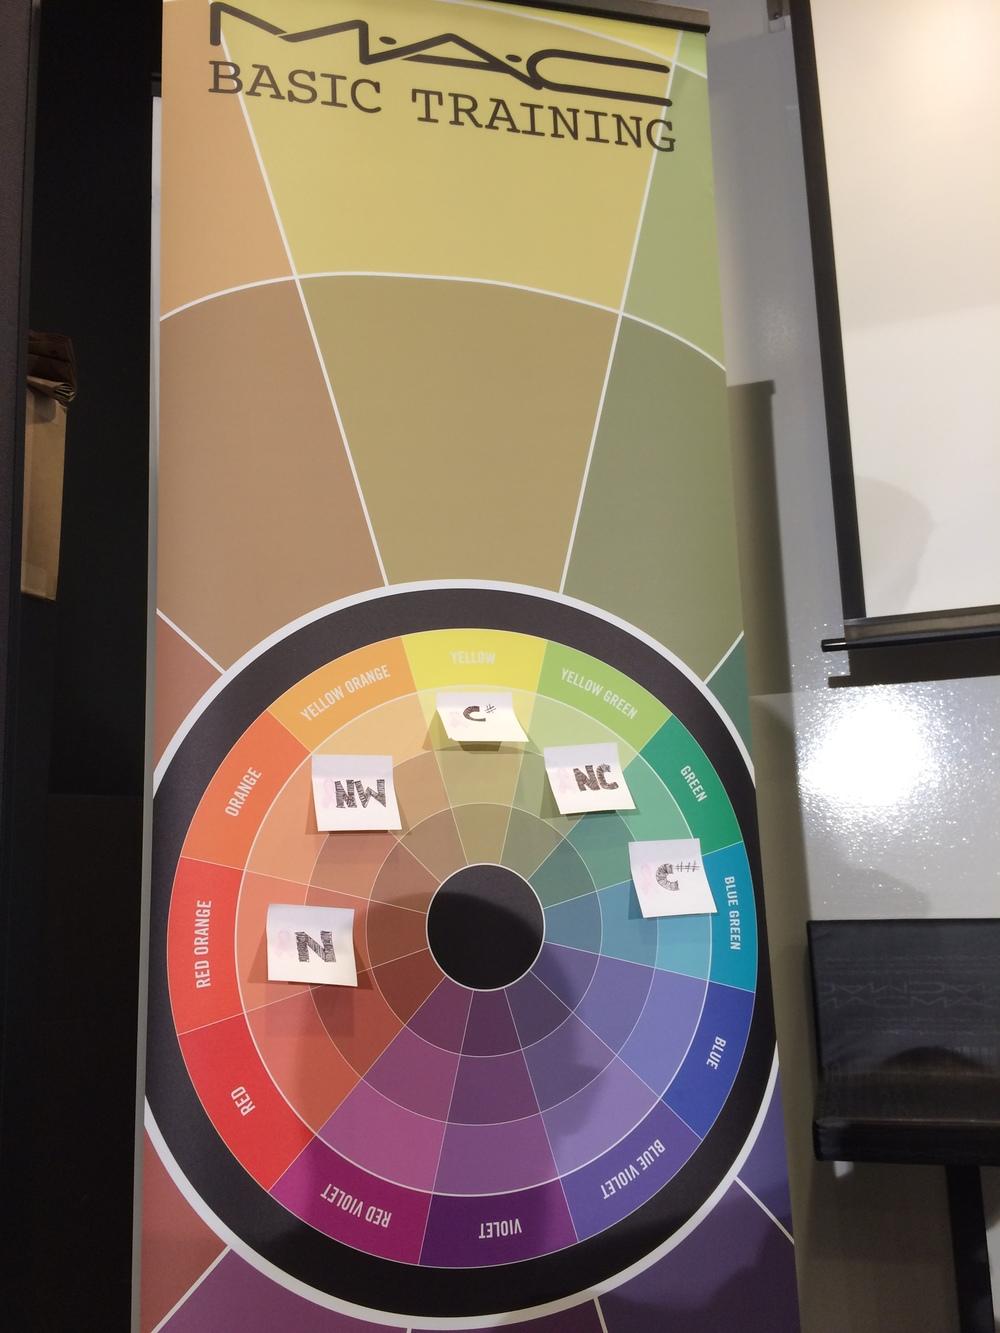 MAC Master Class Color Wheel 101